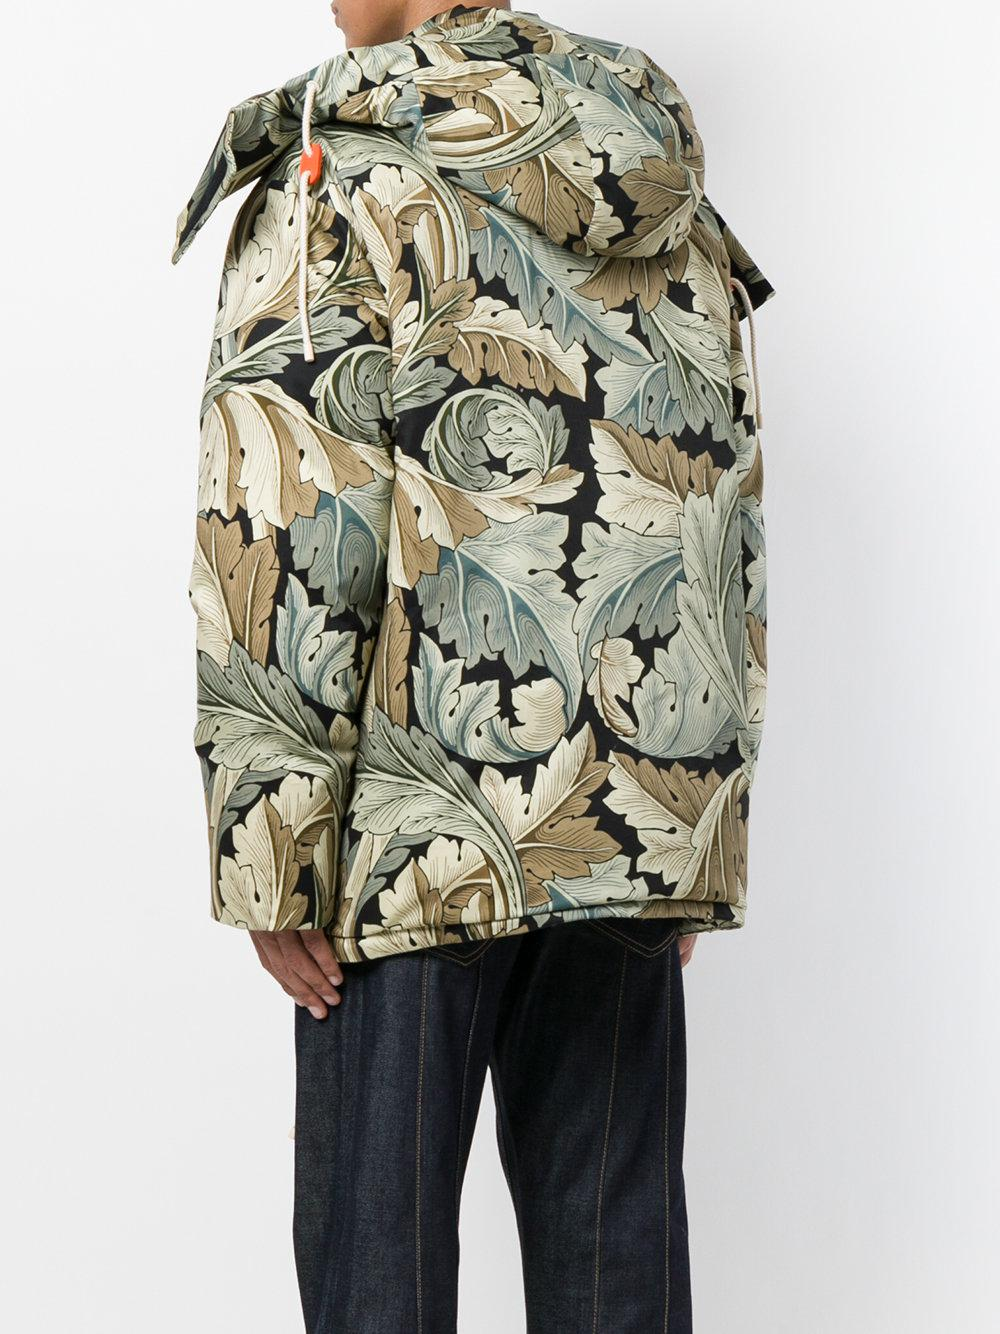 Loewe Cotton X William Morris Acanthus Print Puffer Jacket in Green for Men